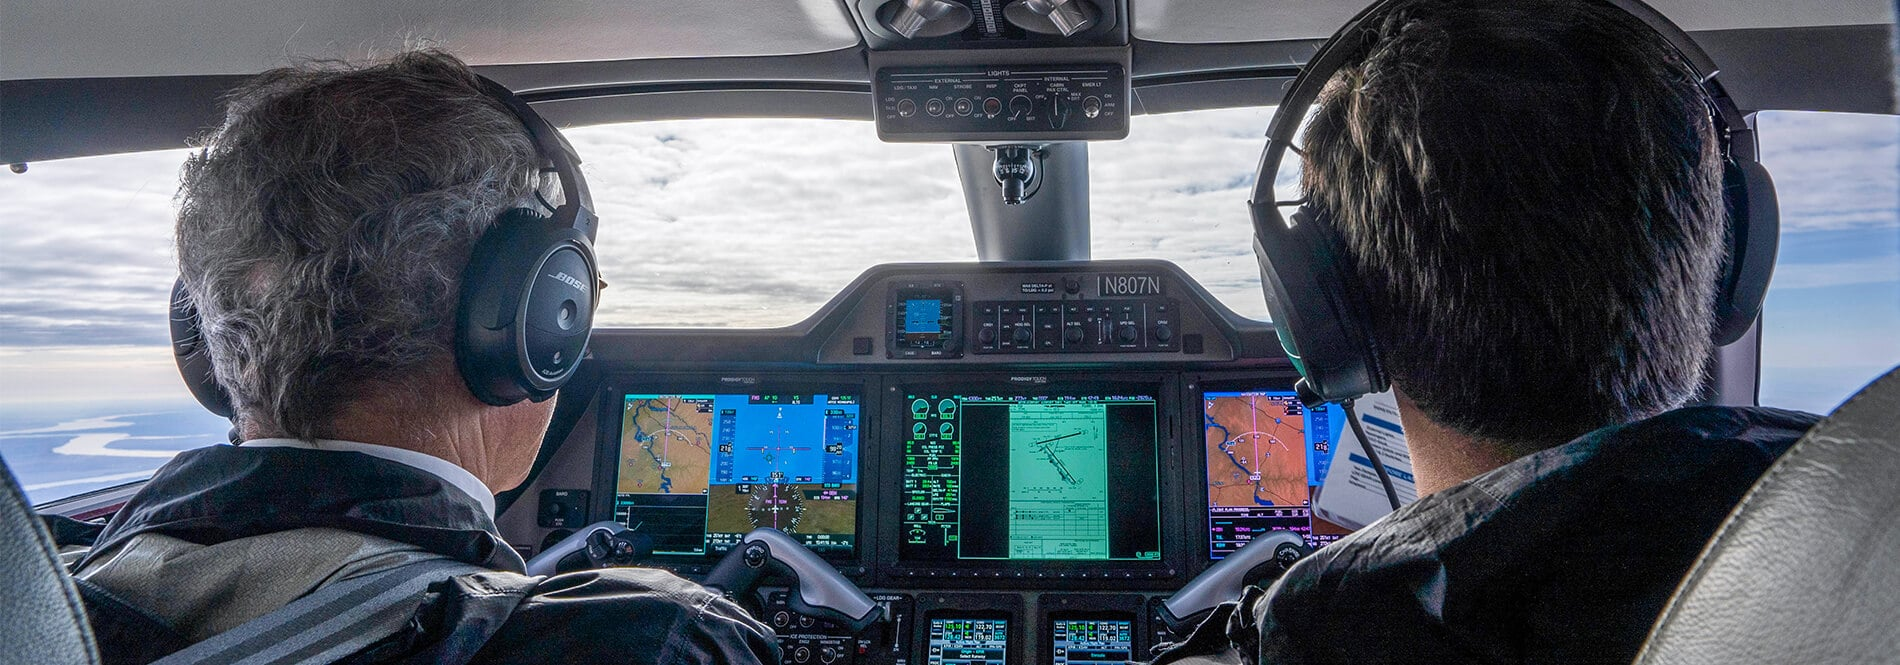 Nicholas Air Pilots in Citation Latitude Cockpit